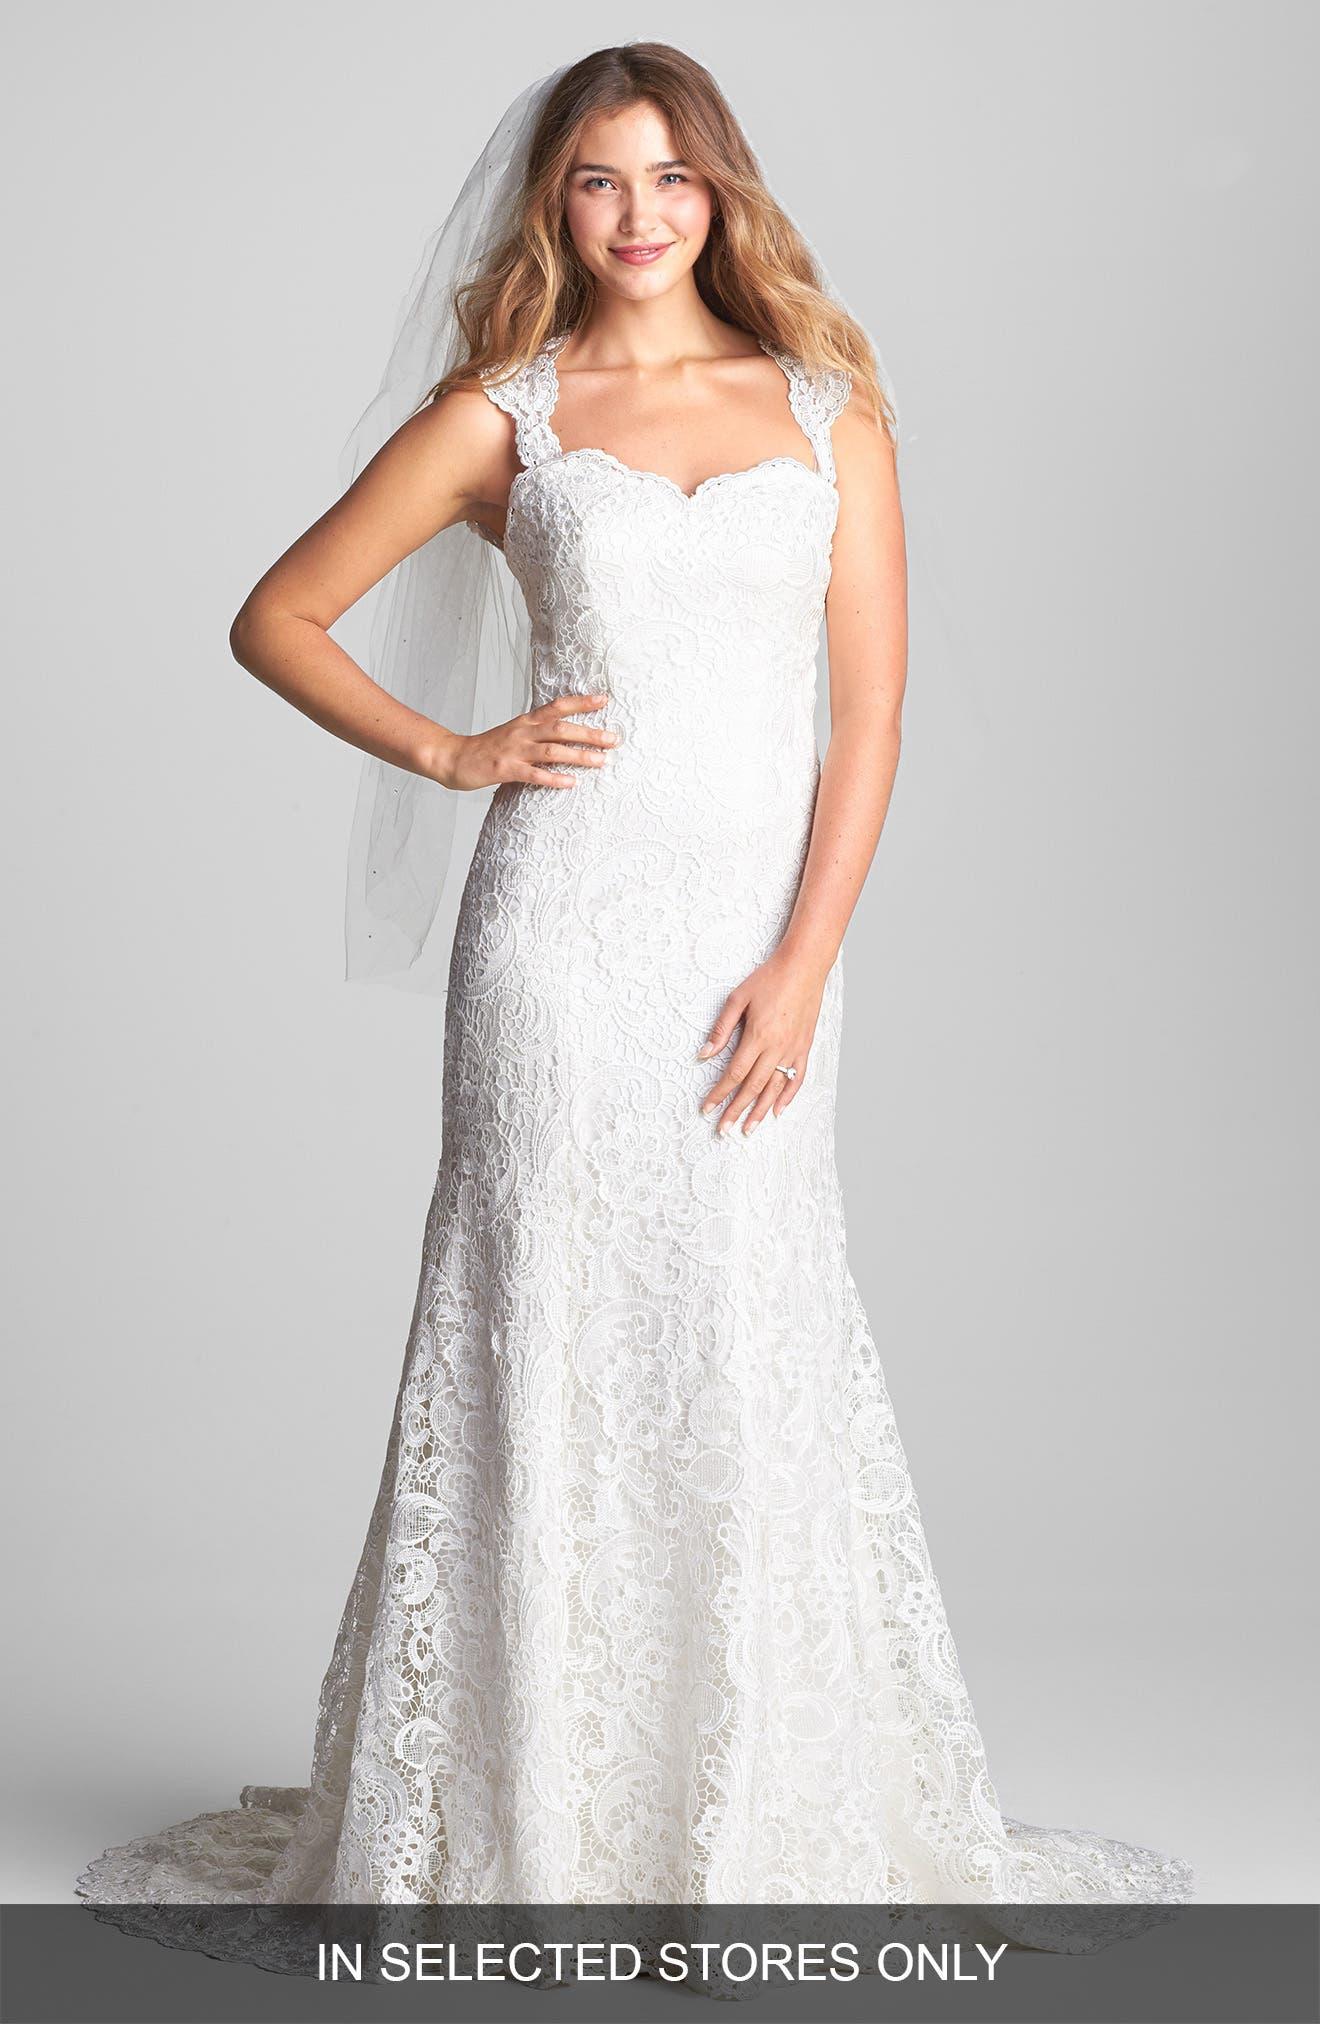 Main Image - Olia Zavozina Ann Lace Fluted Dress